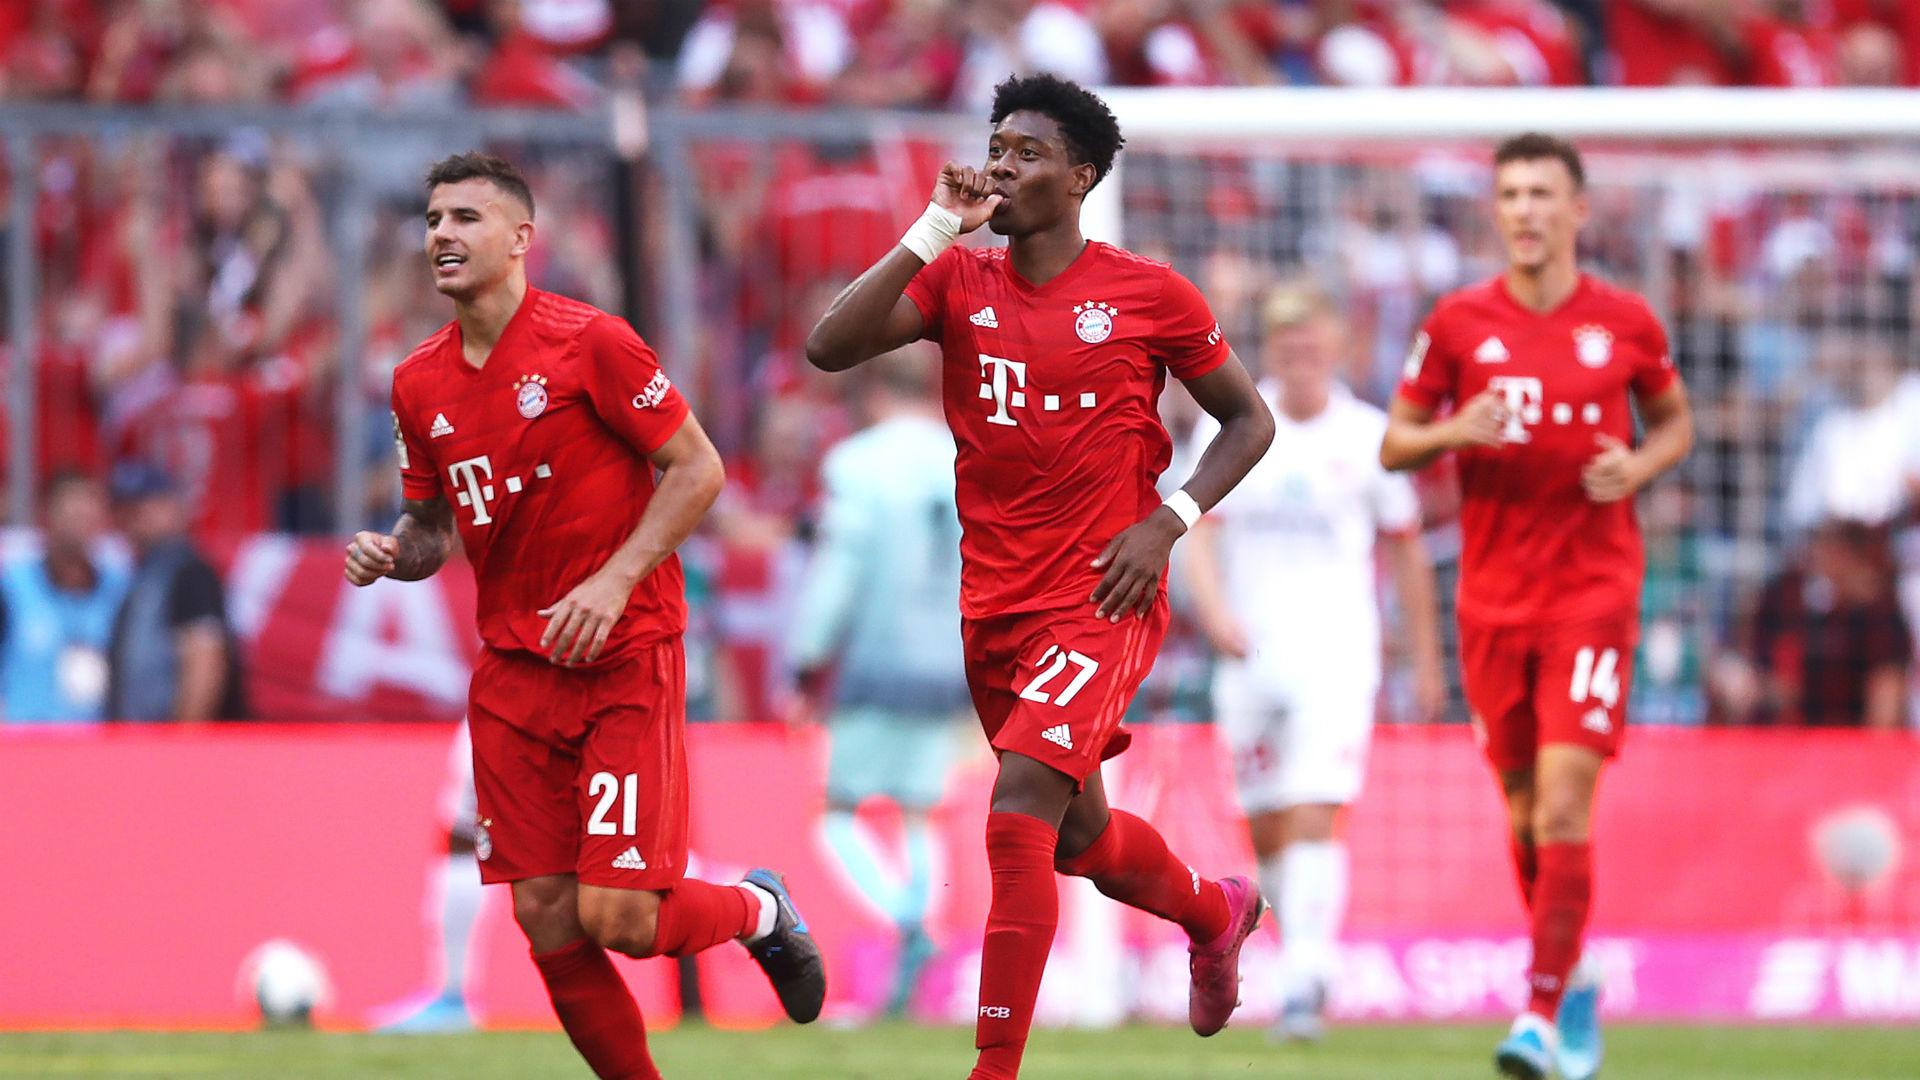 Bayern München v Mainz 05 Match Report, 31/08/2019, Bundesliga | Goal.com